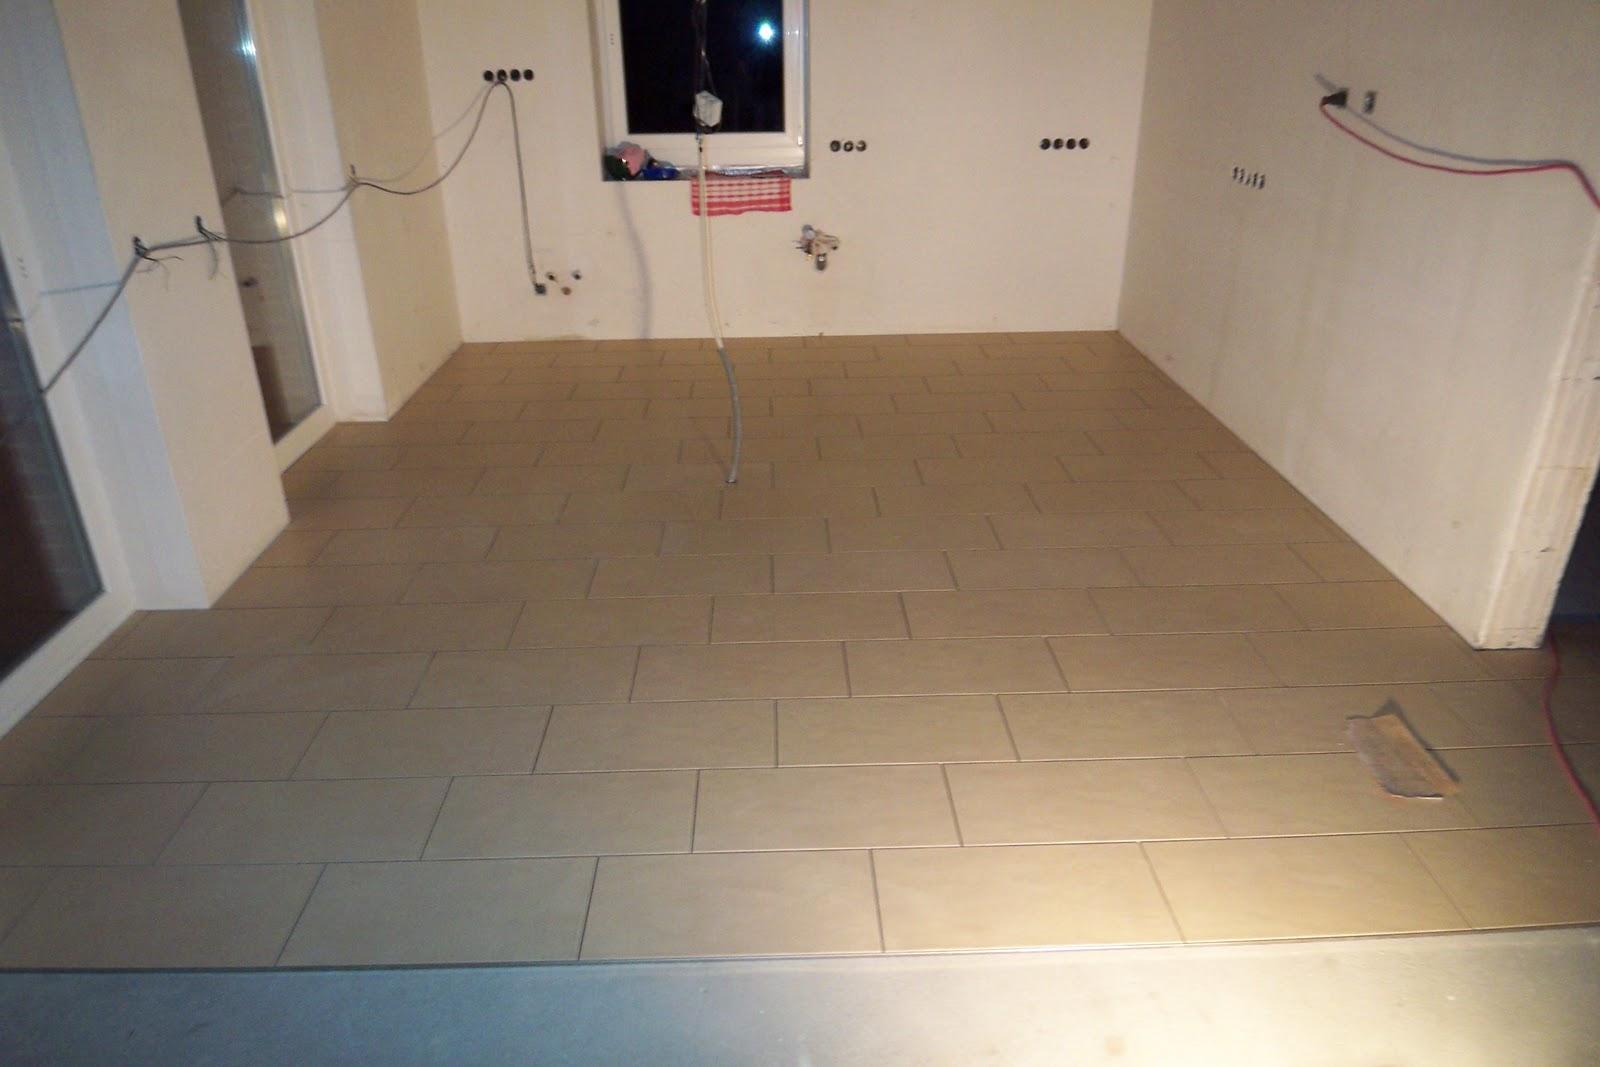 Fliesen Legen Wand Küche. Ikea Montageanleitung Küche Arbeitsplatte ...